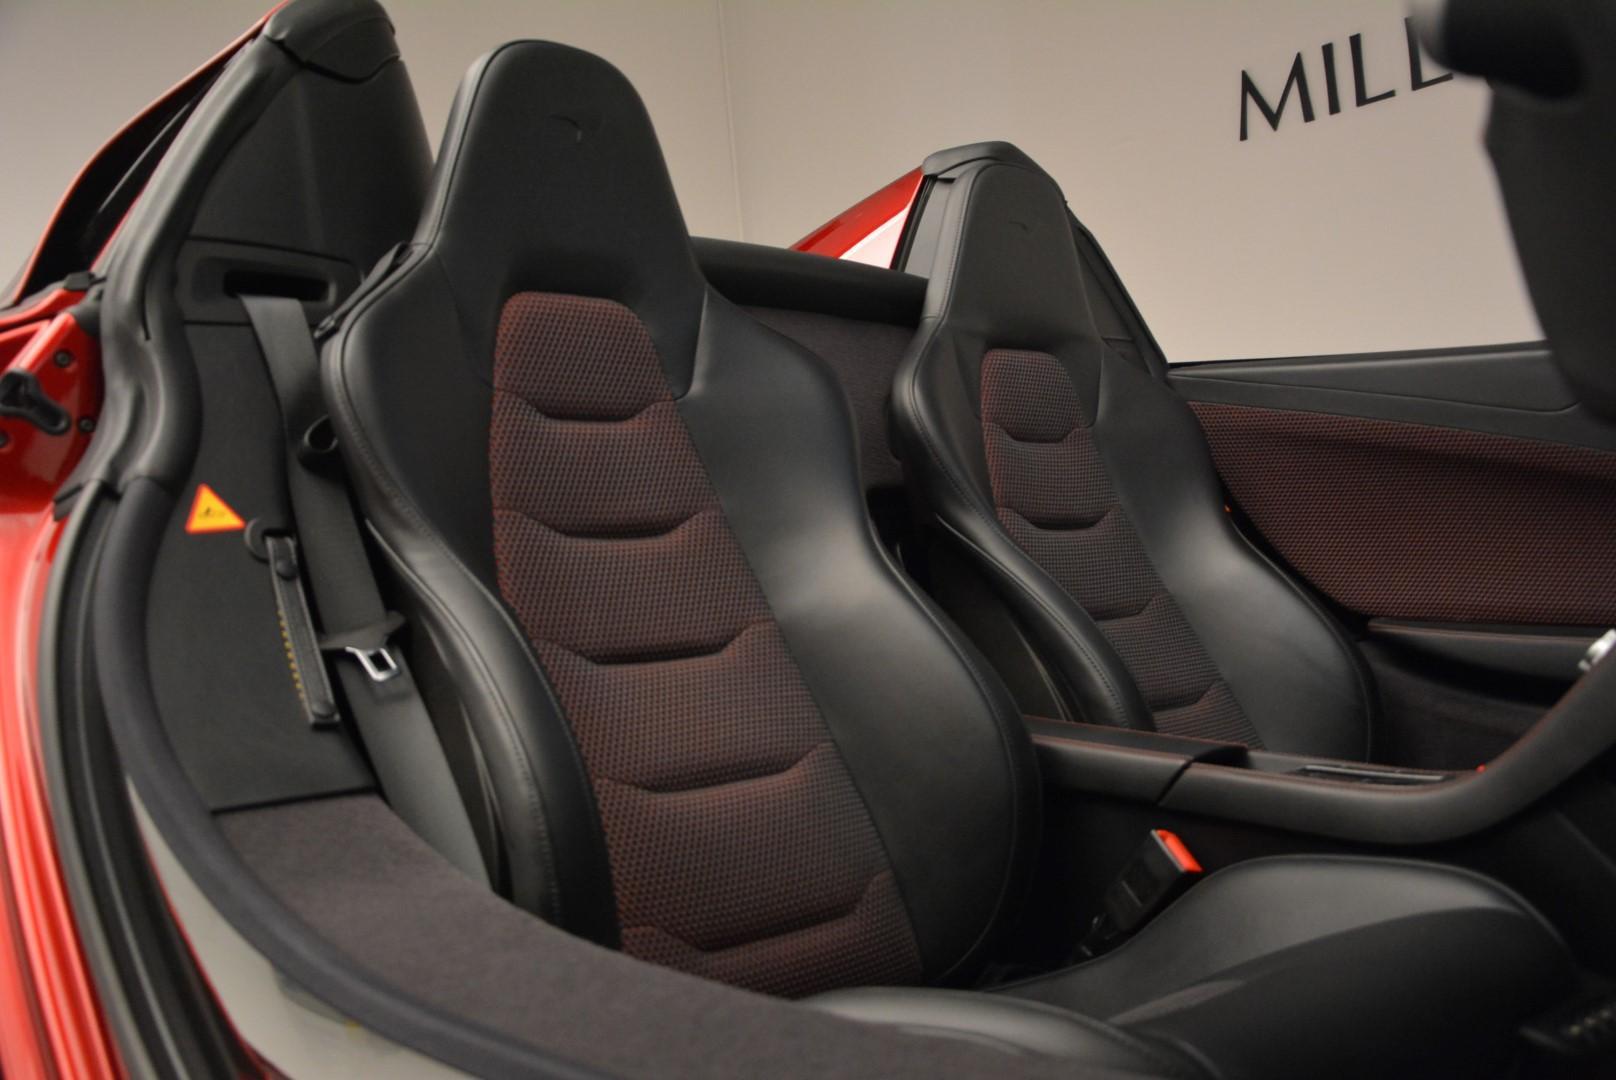 Used 2013 McLaren MP4 12C Base